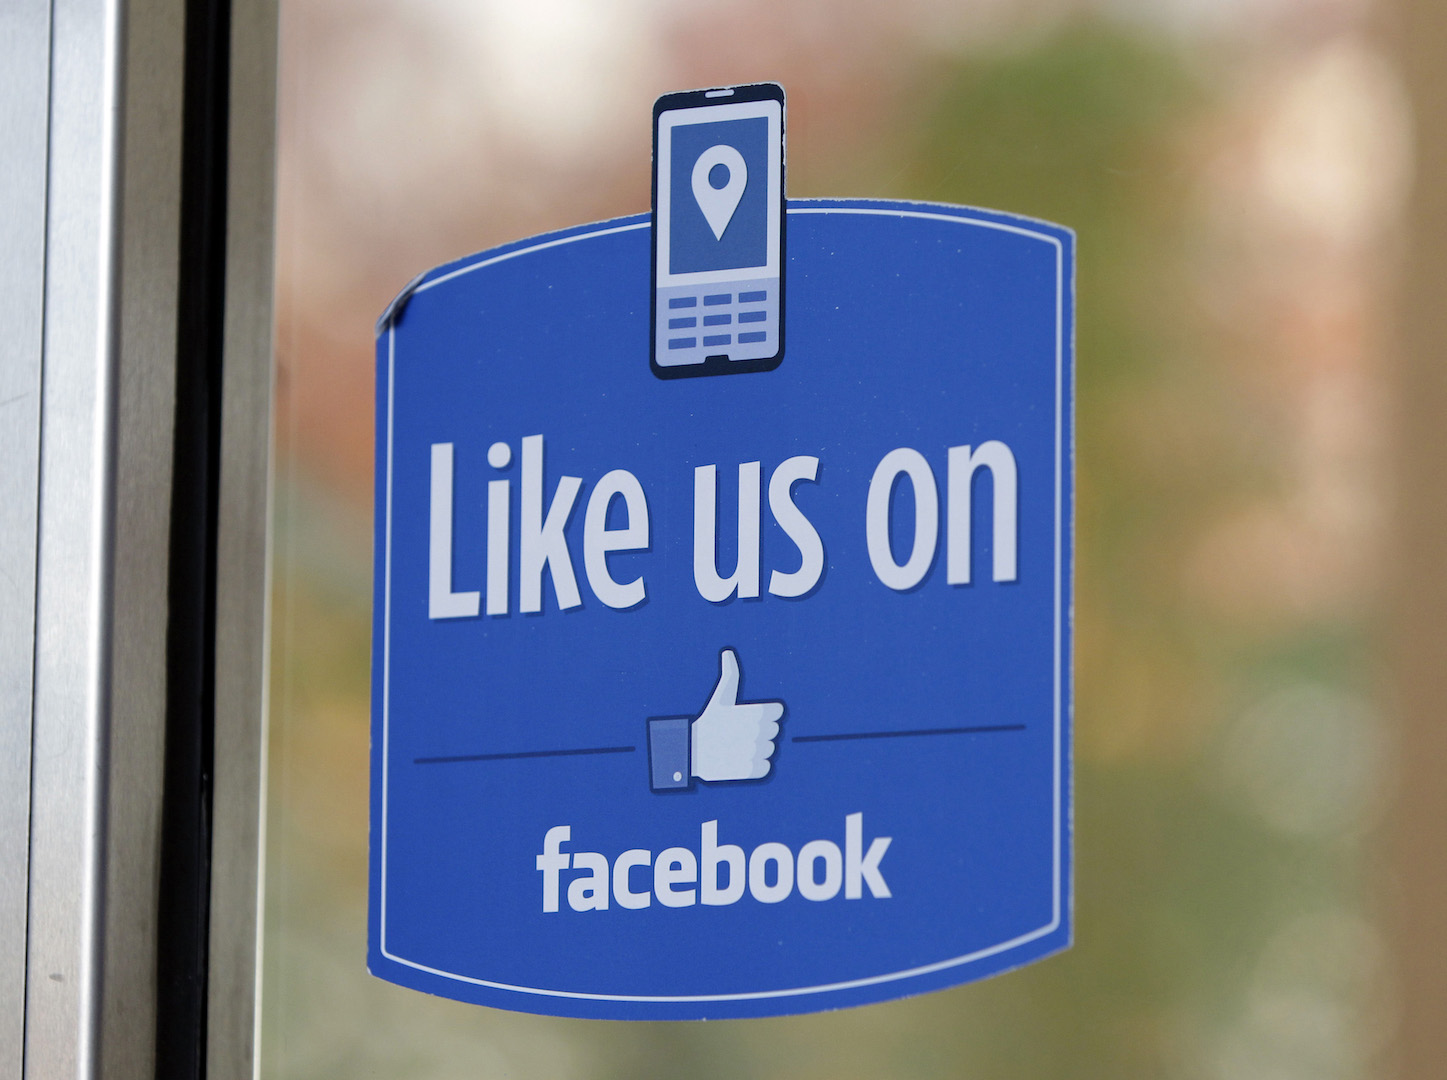 Cambio-decada-Diez-anos-Mark-Zuckerberg-Facebook